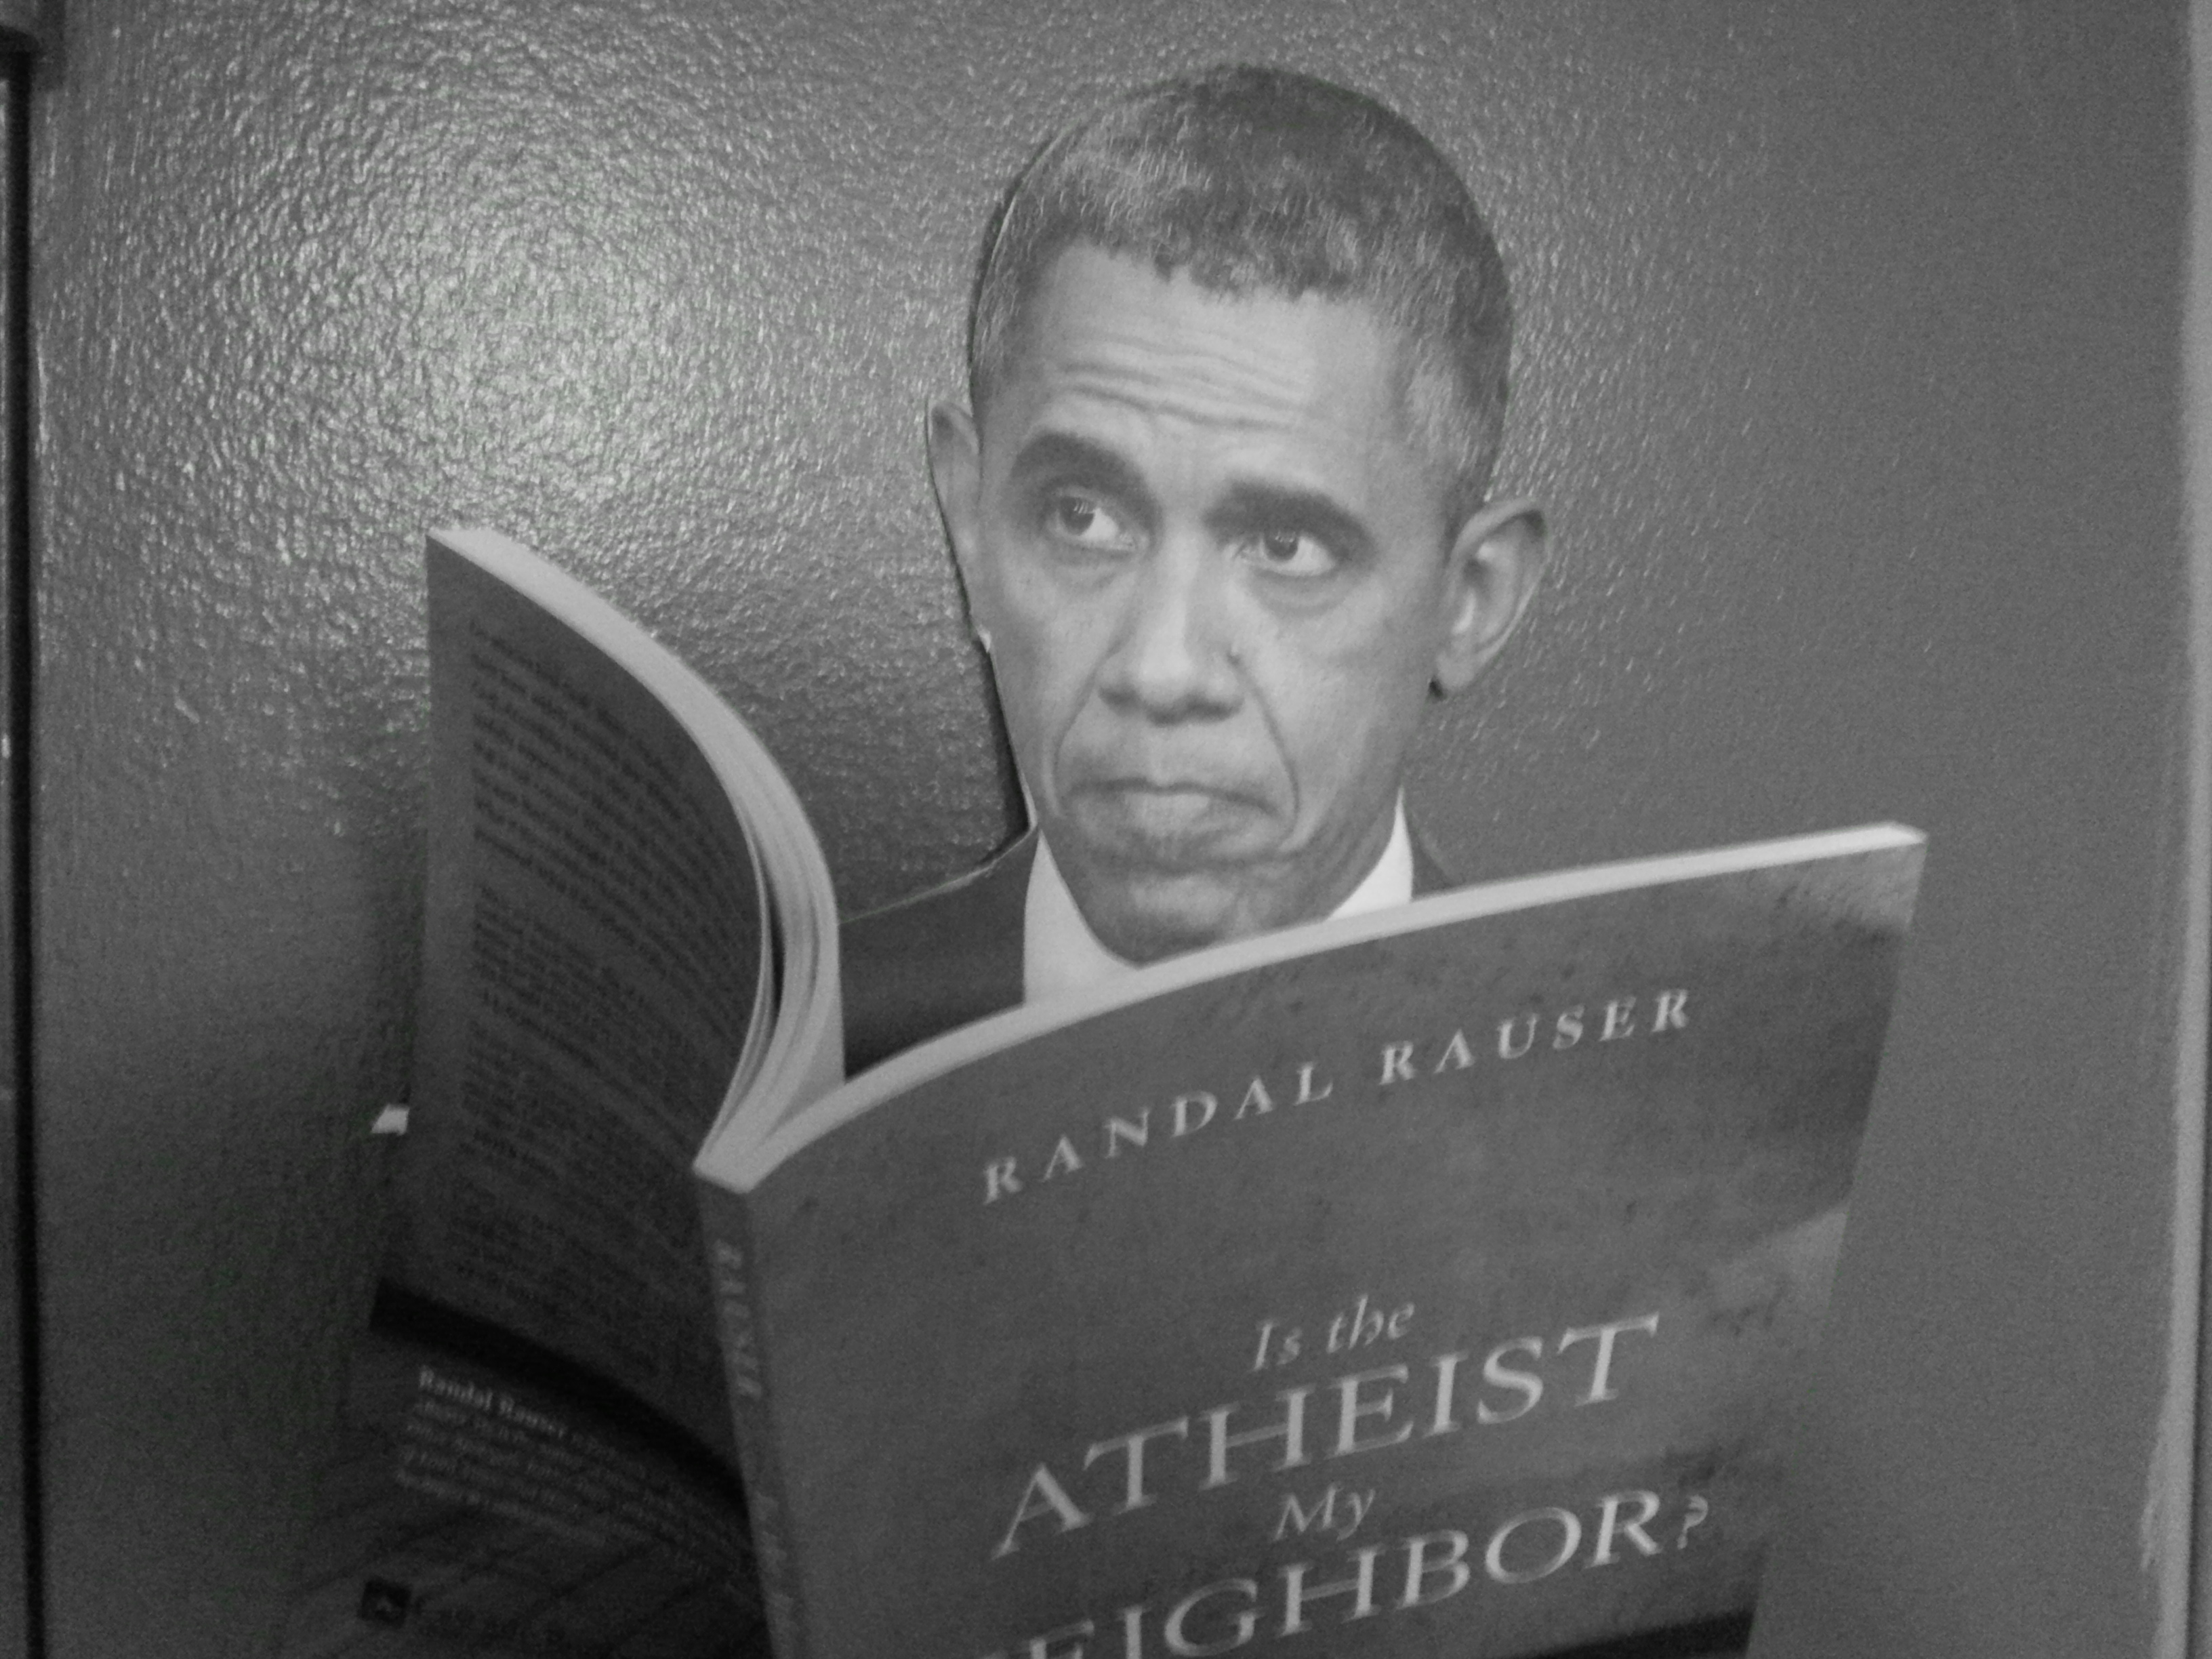 Barack Obama On Is The Atheist My Neighbor